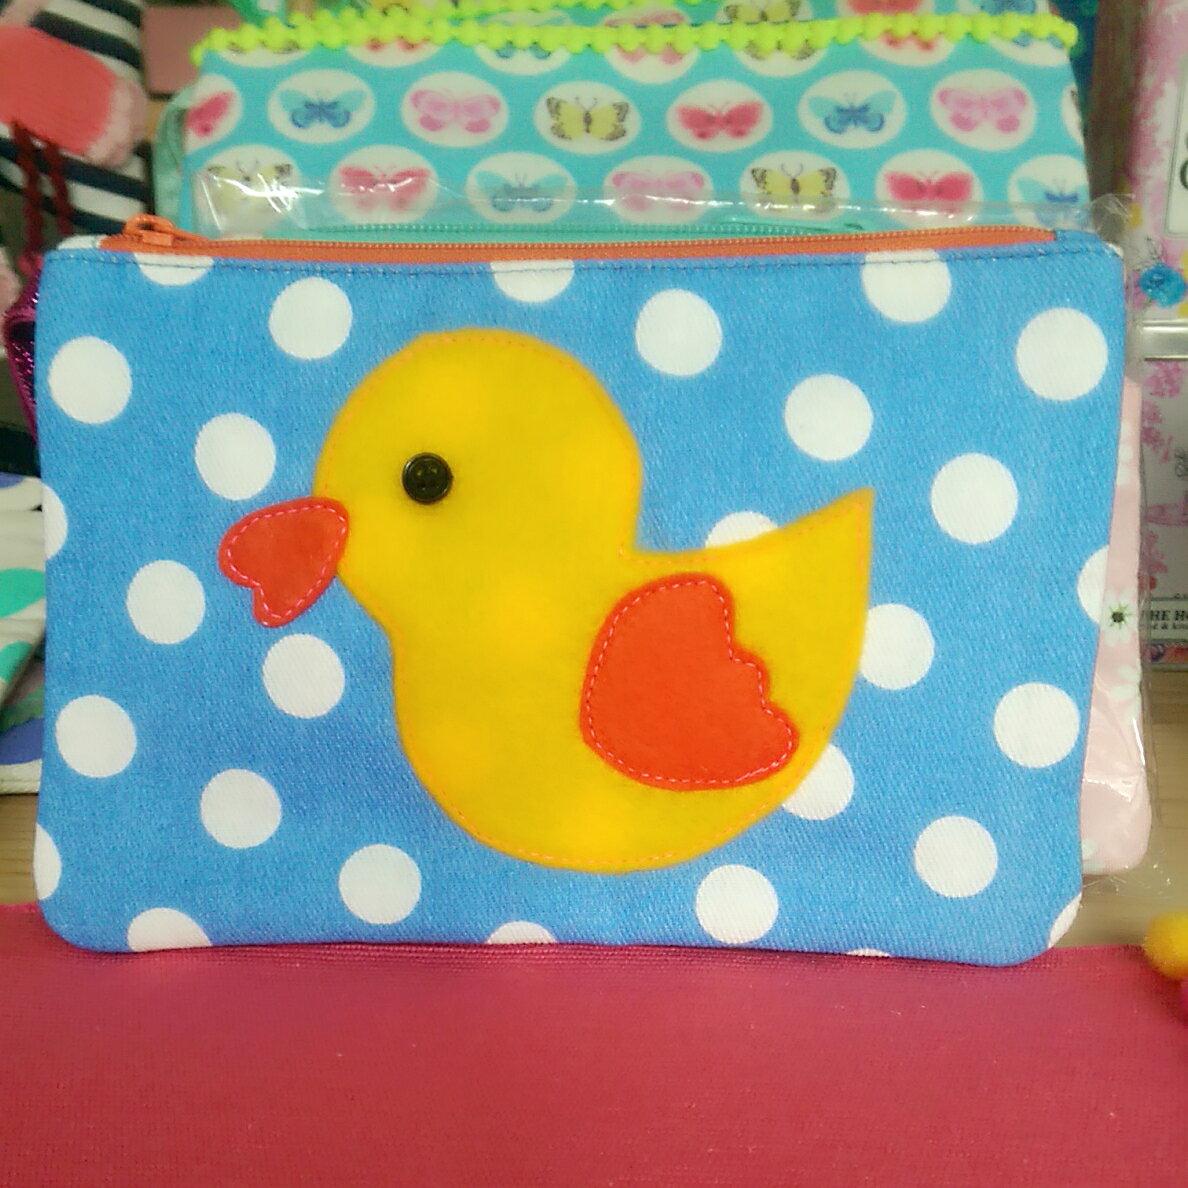 Ginger手作可愛動物造型收納包 眼鏡袋 筆袋 零錢包